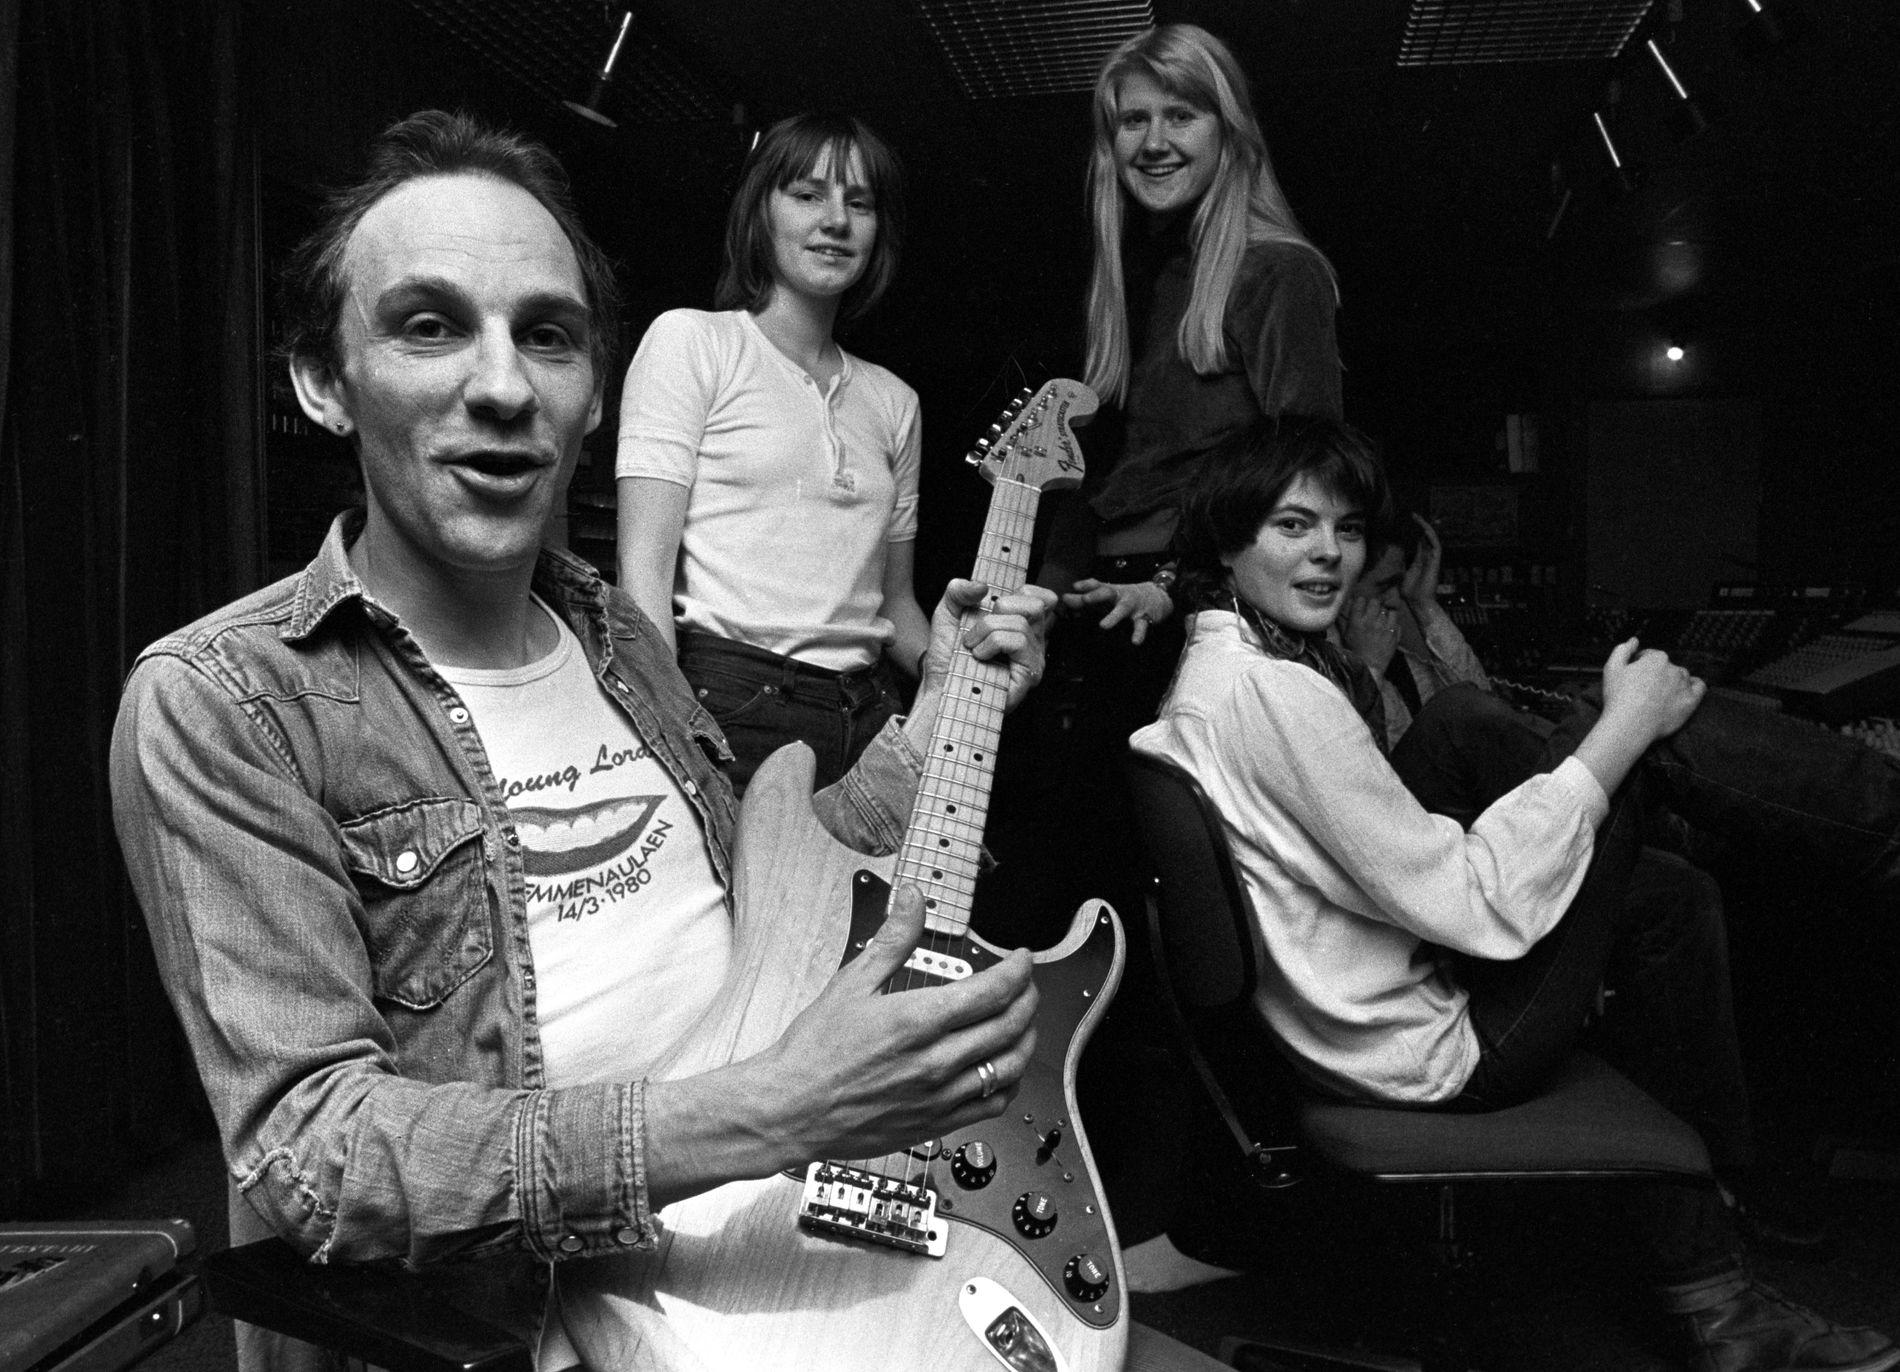 VESLEFRIKK: Det norske bandet Veslefrikk (1977–1982) med Per Vestaby. I bakgrunnen bl.a. Hege Rimestad og Anne Grete Preus.